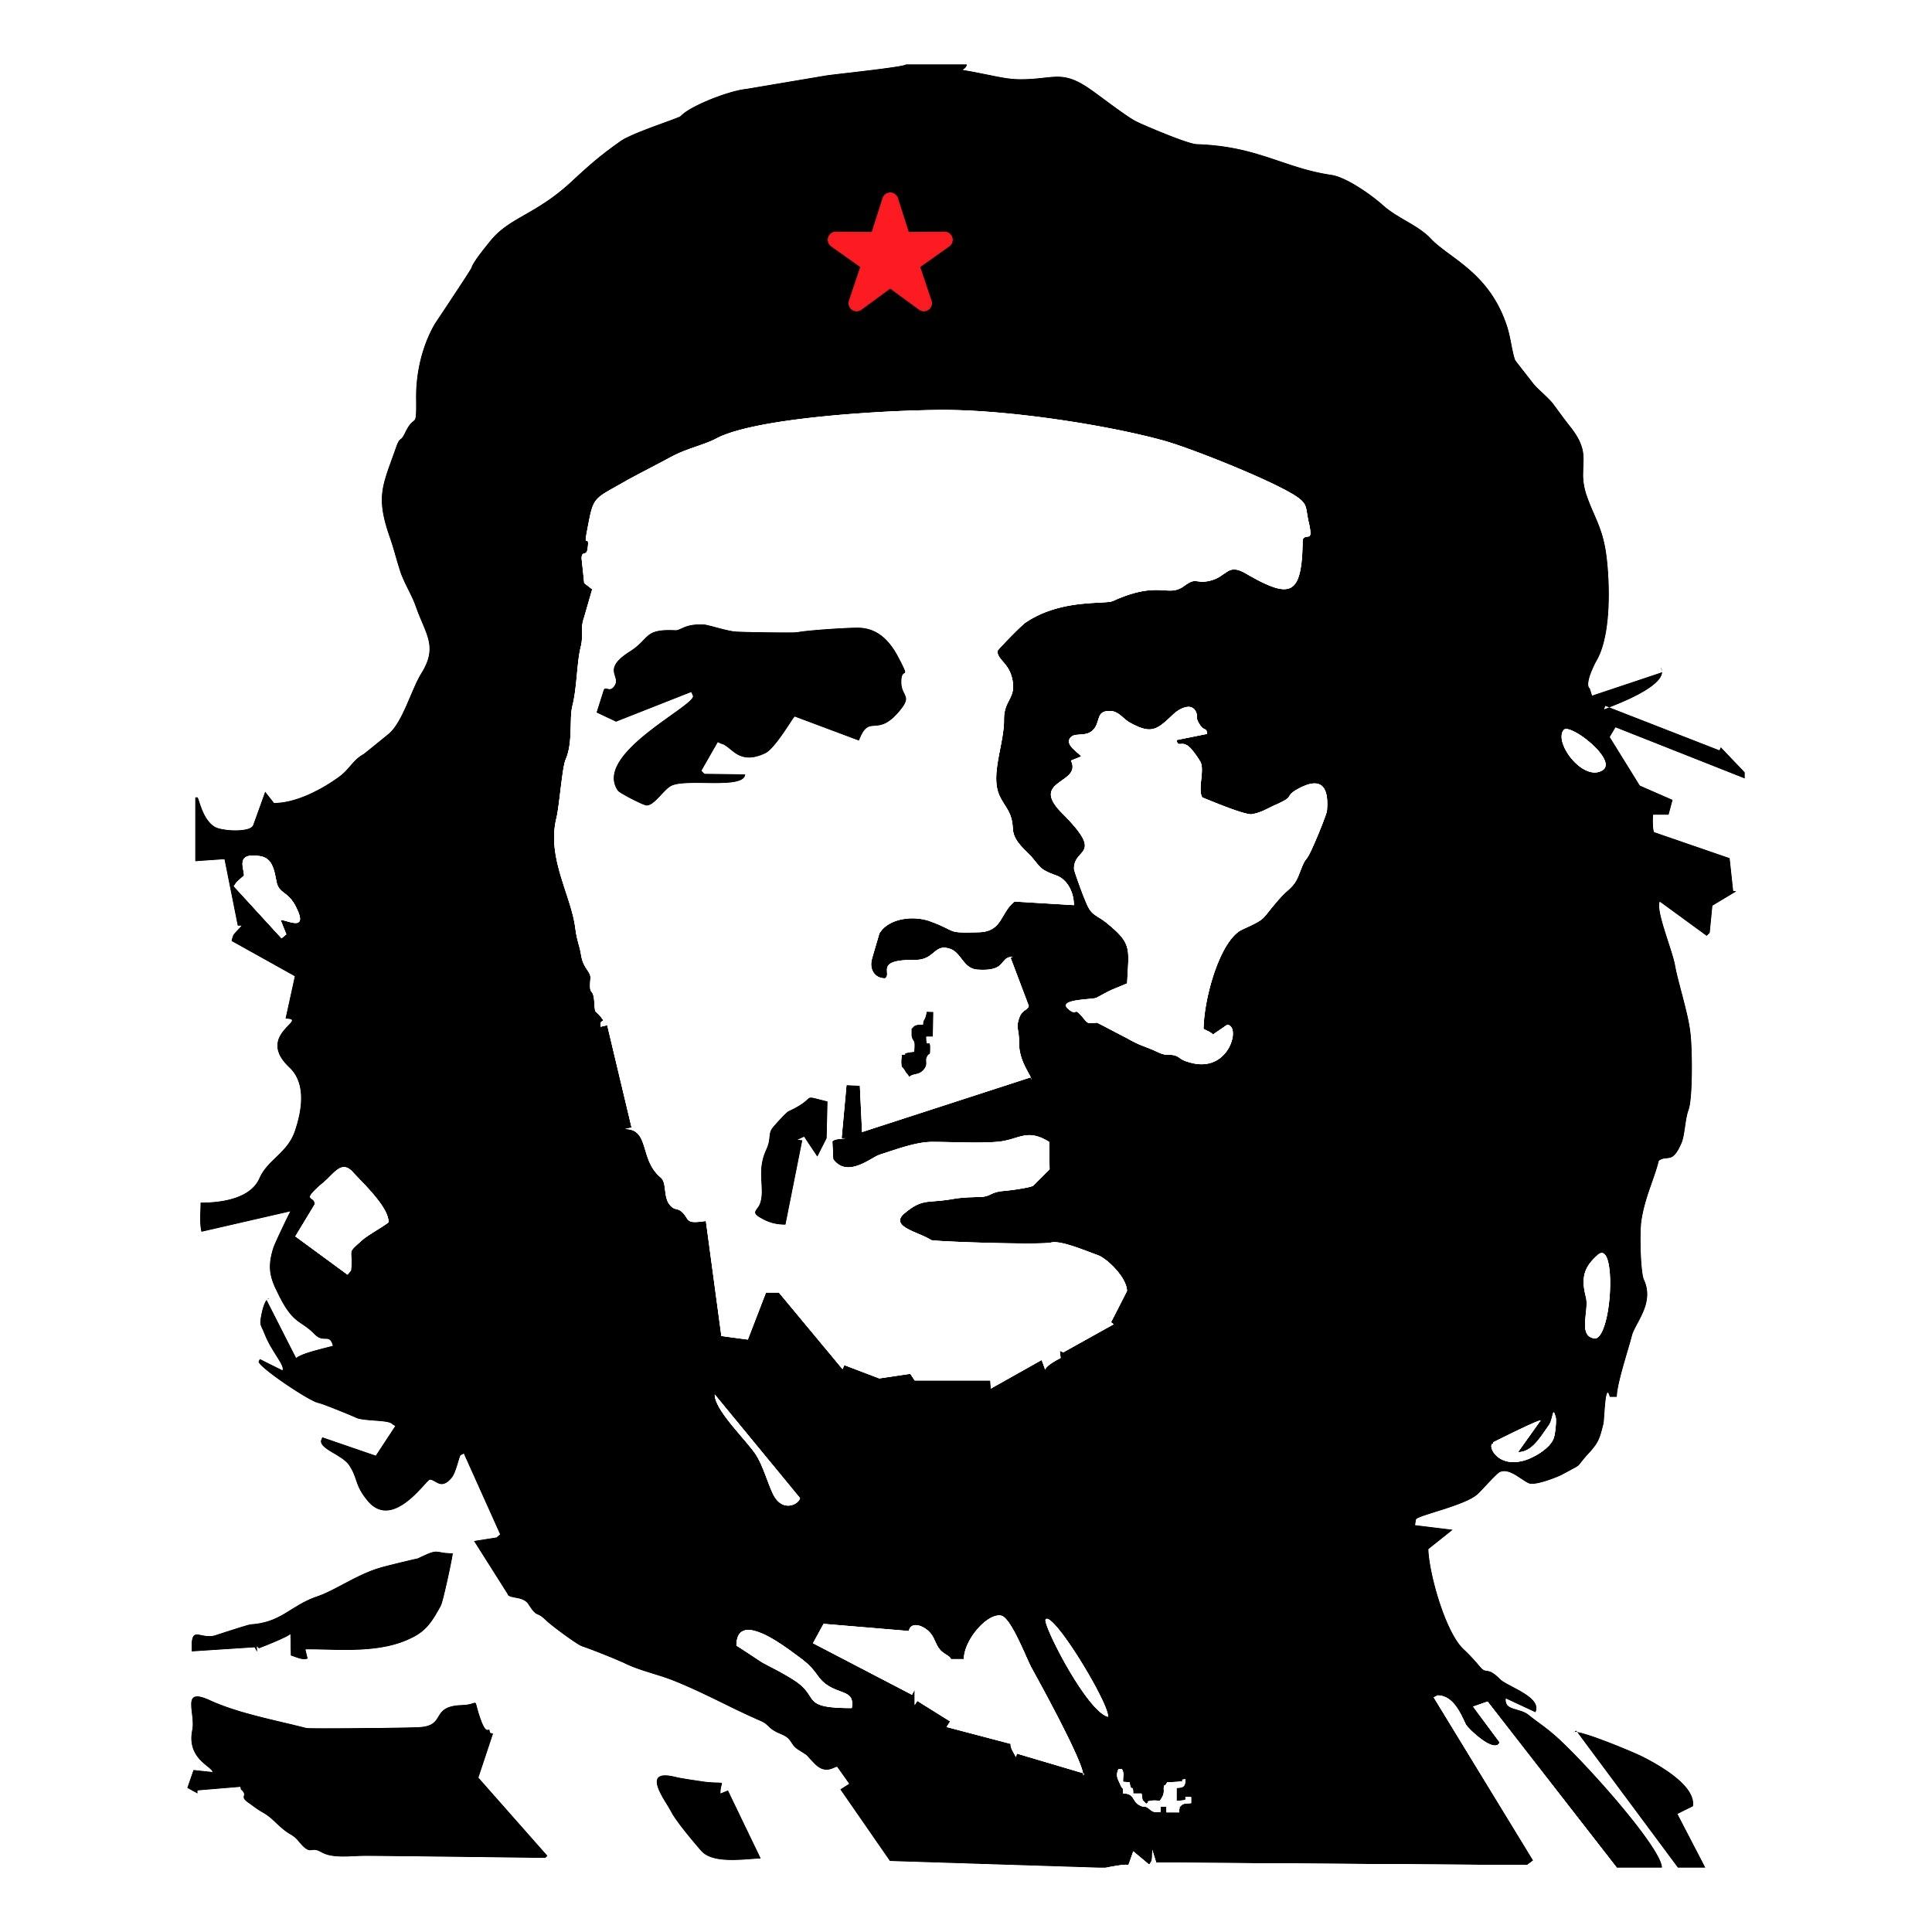 Aufkleber Che Guevara Kontur 135 x 110 mm – Bild 1